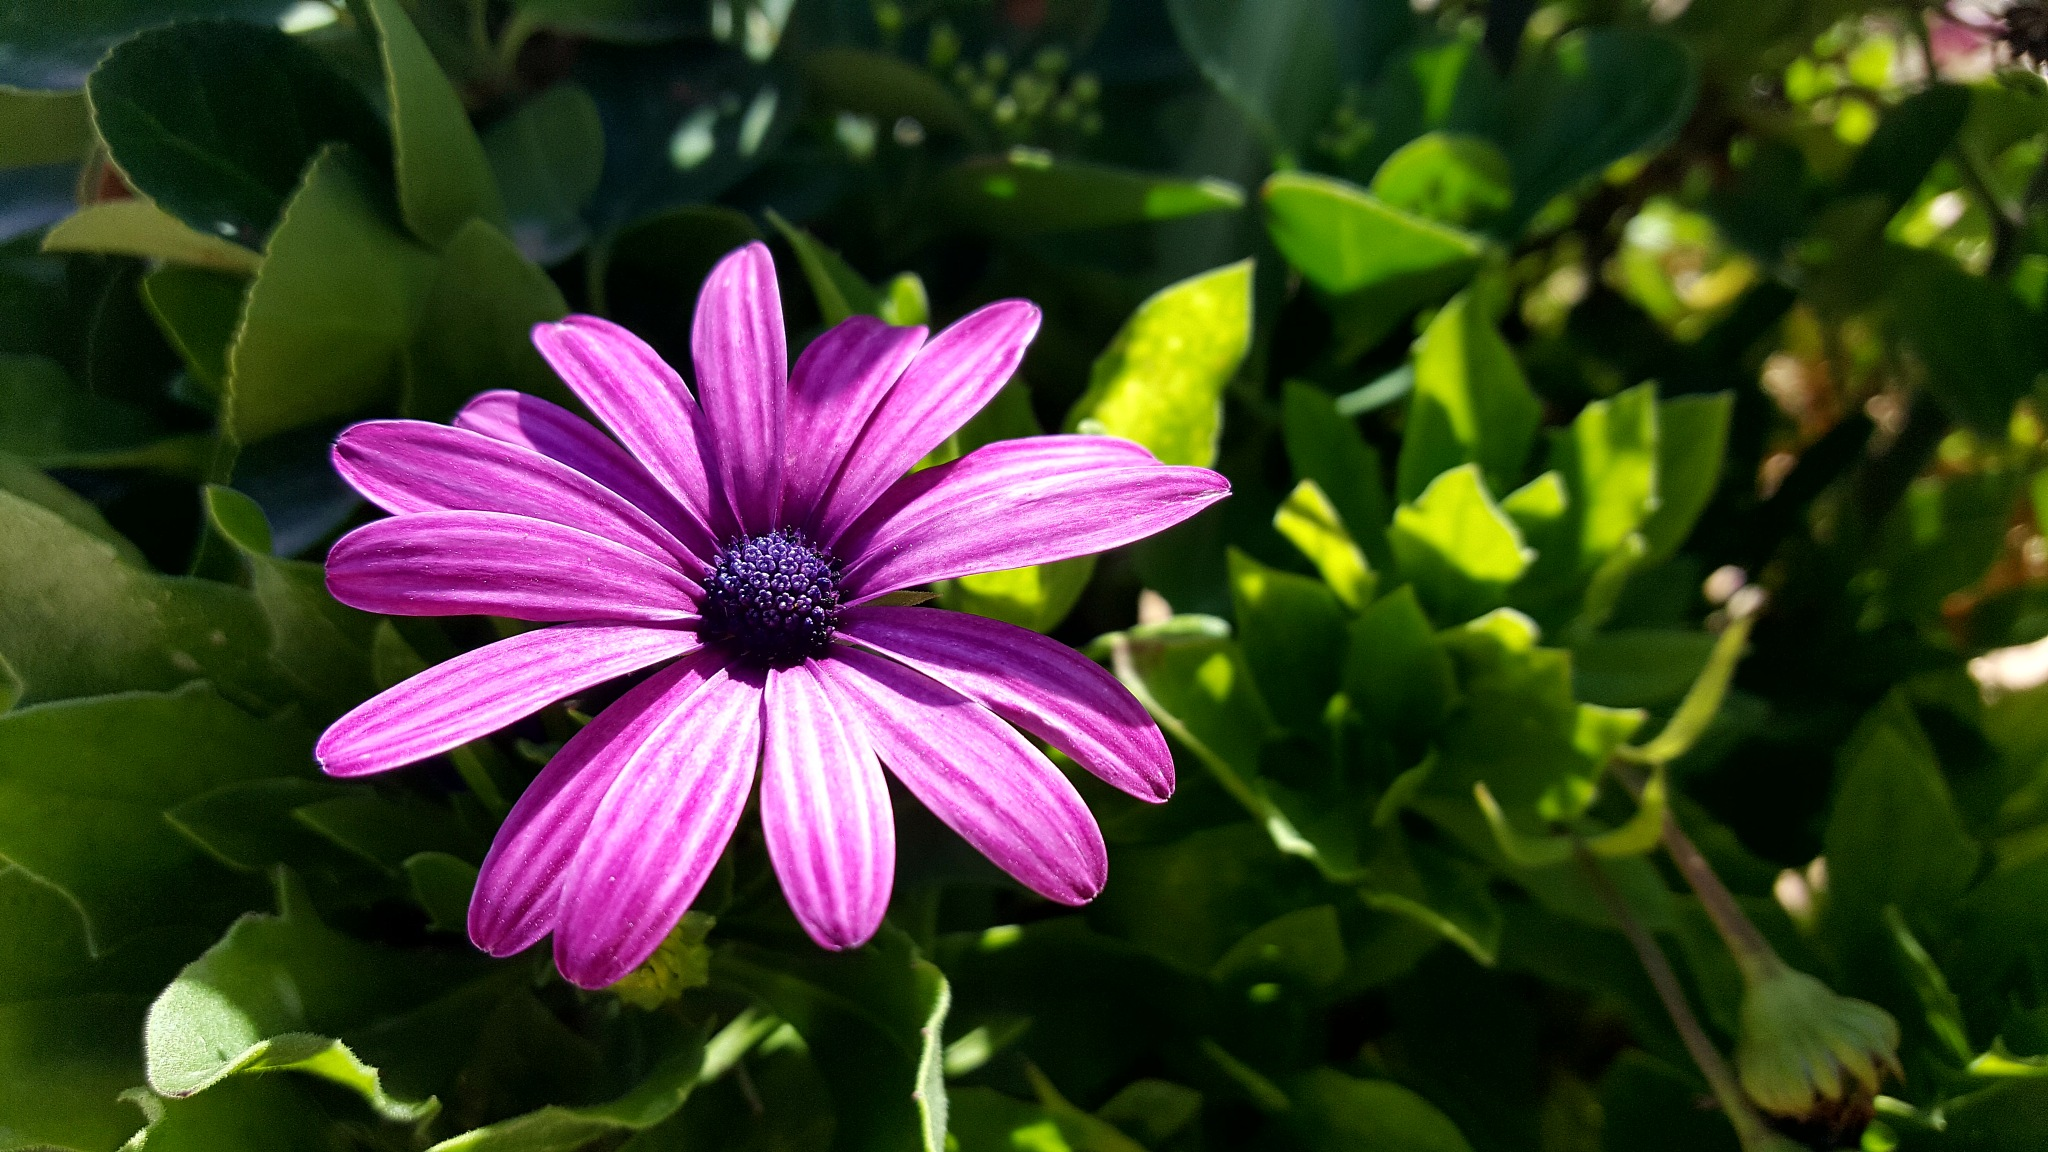 flowers by zakaria sadouni